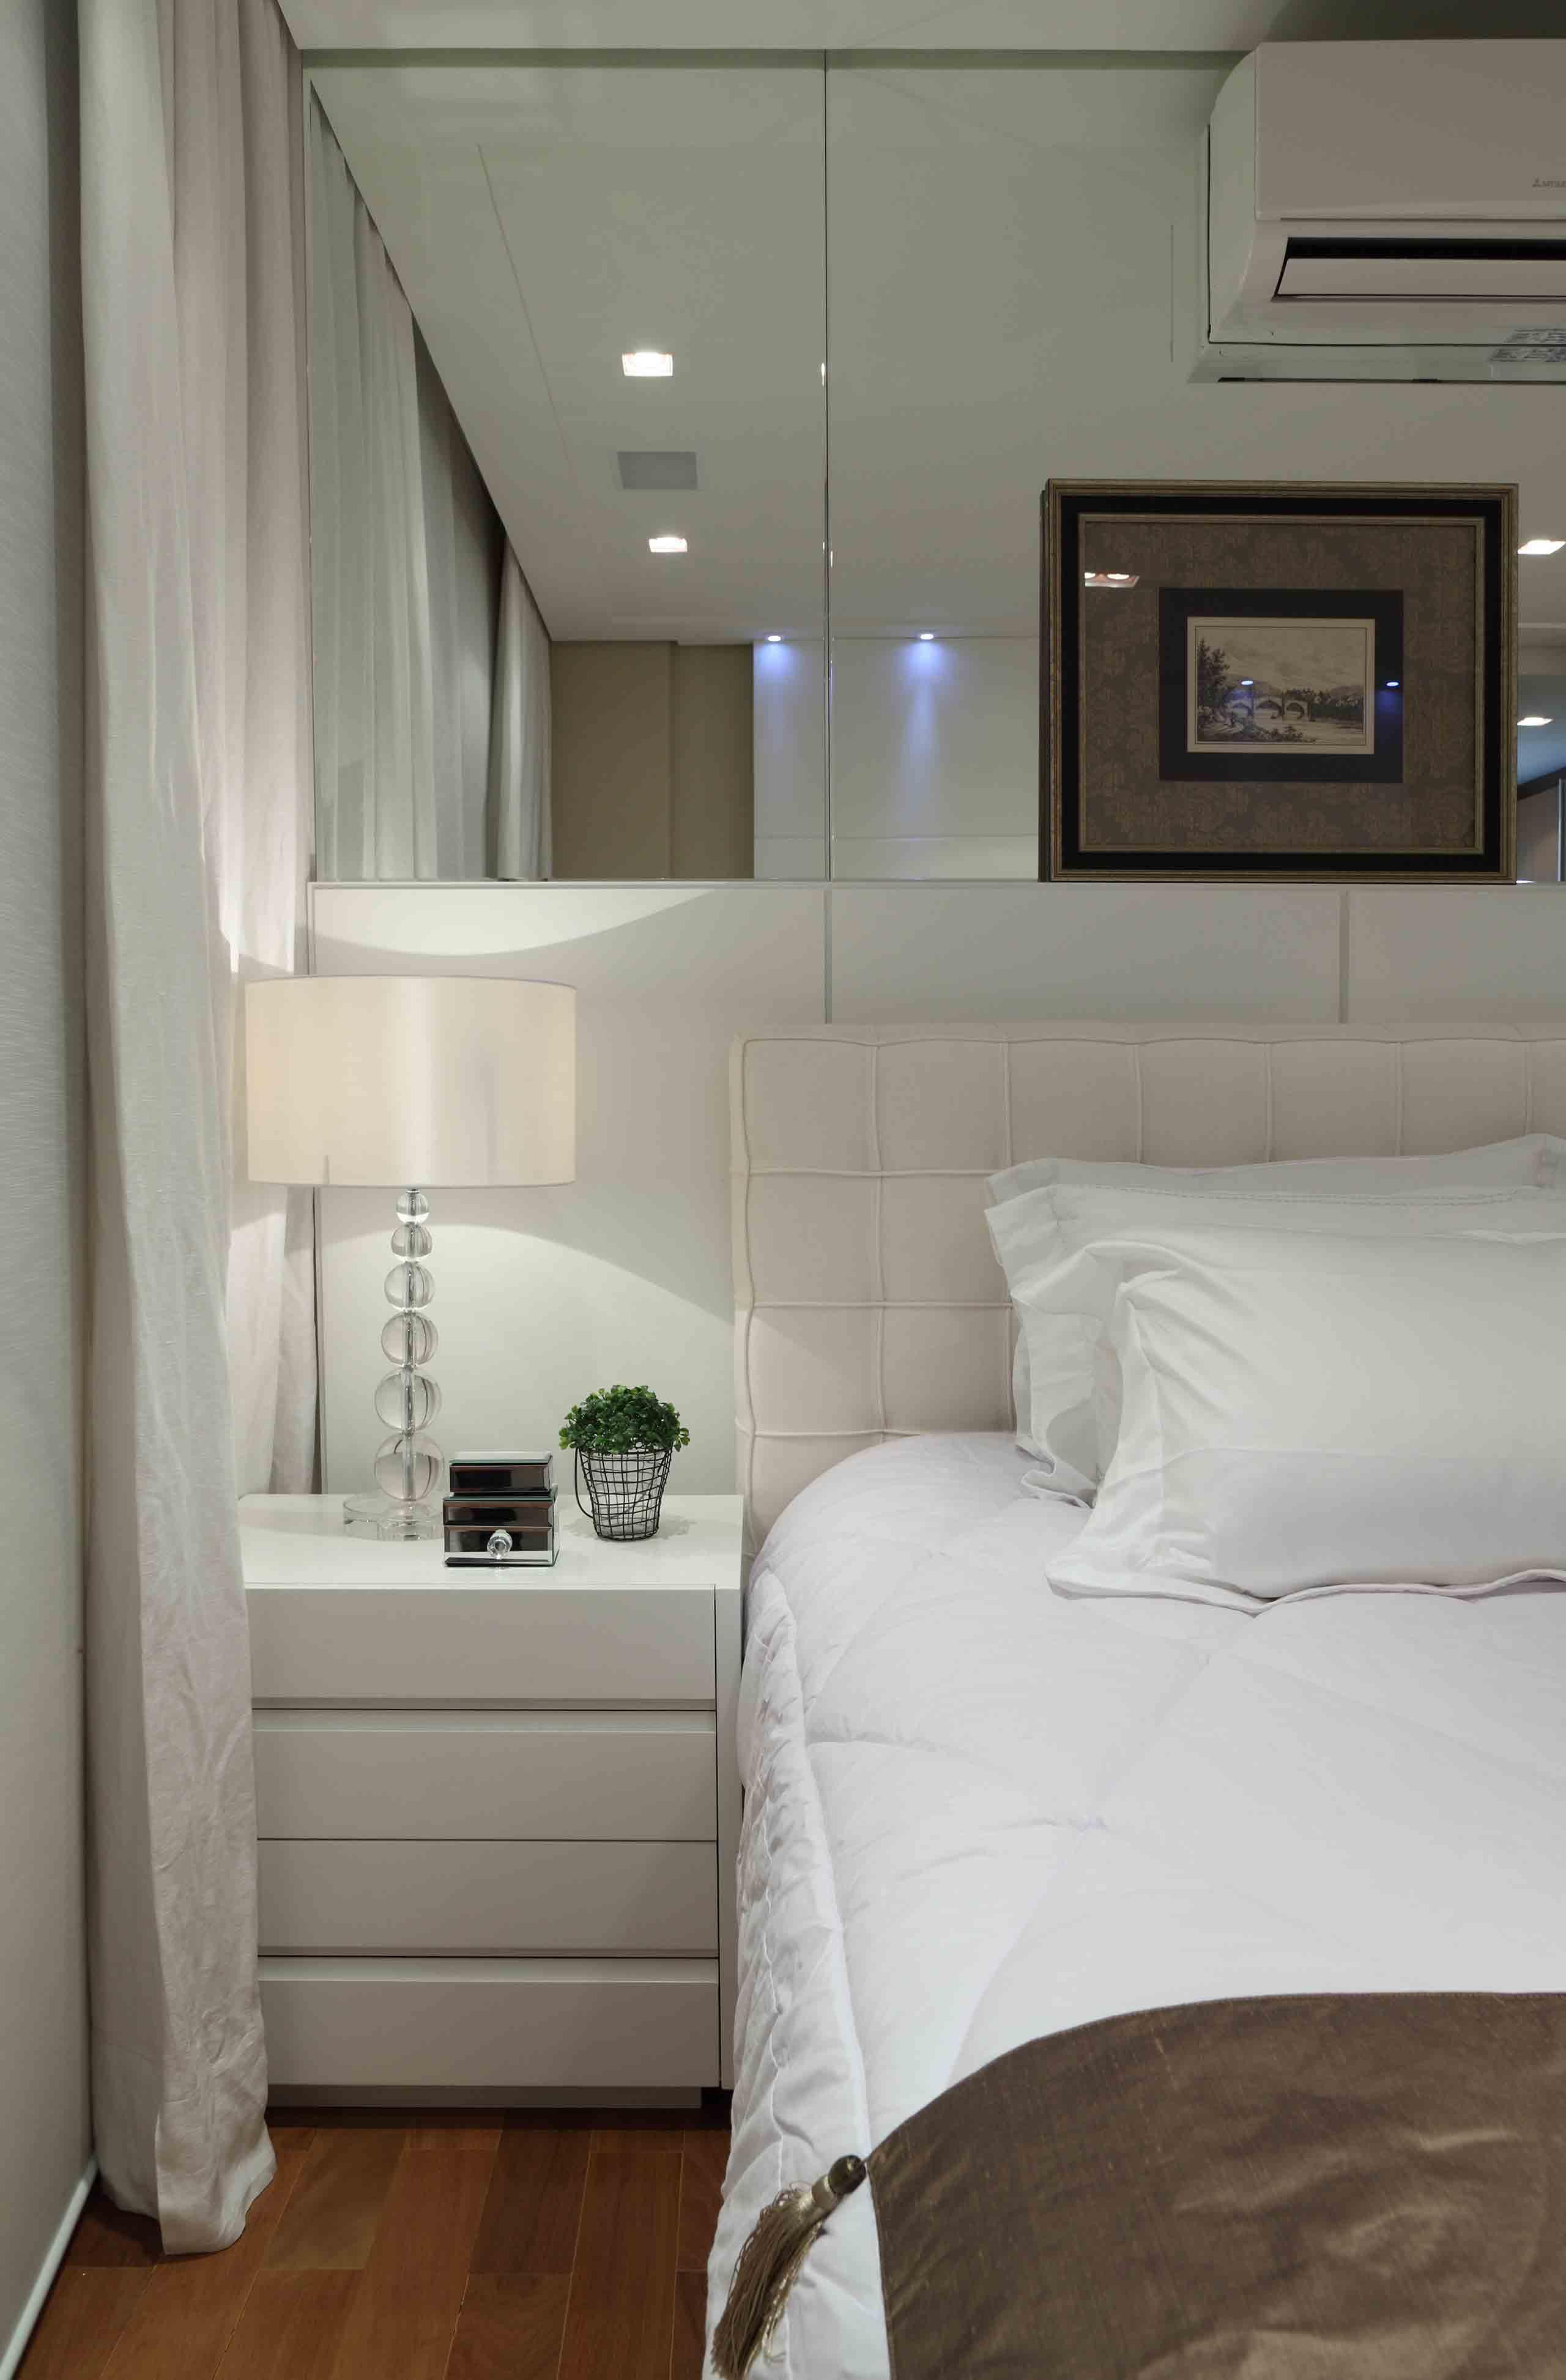 60 cabeceiras de cama estofadas modelos fotos - Modelo de camas ...